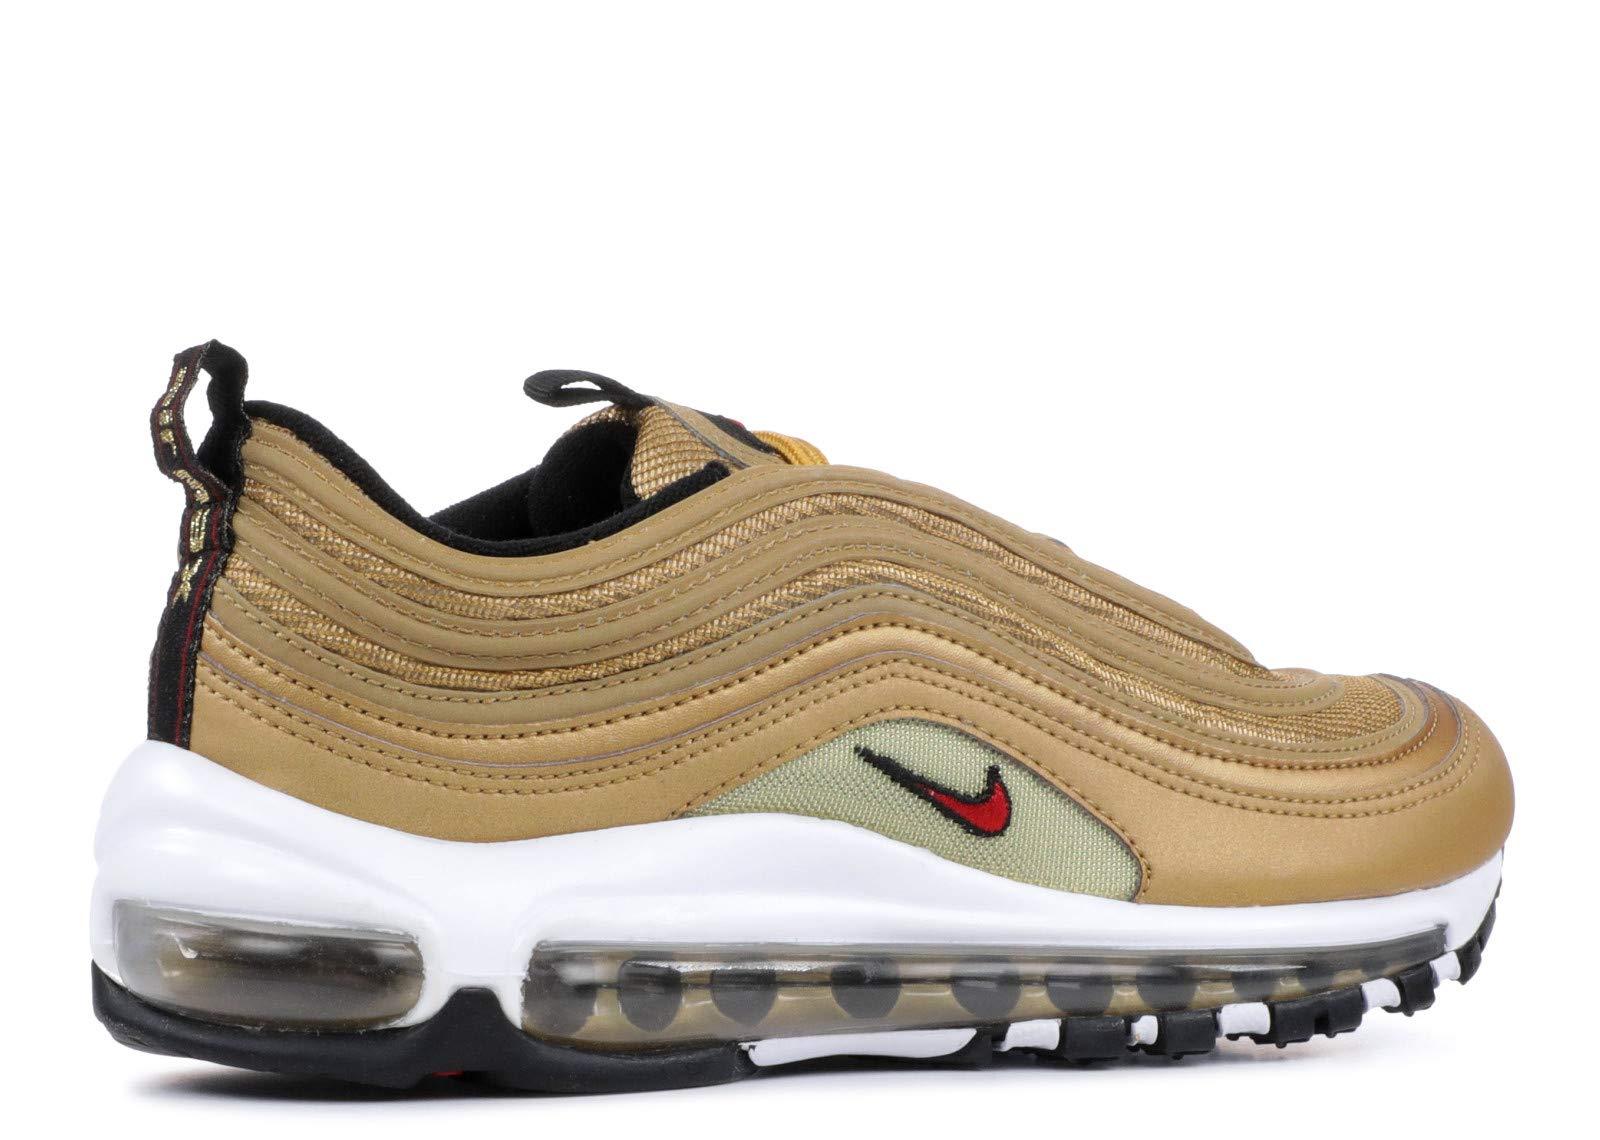 reedmakickz — Nike Air Max 97 OG QS Metallic Gold Womens sizes